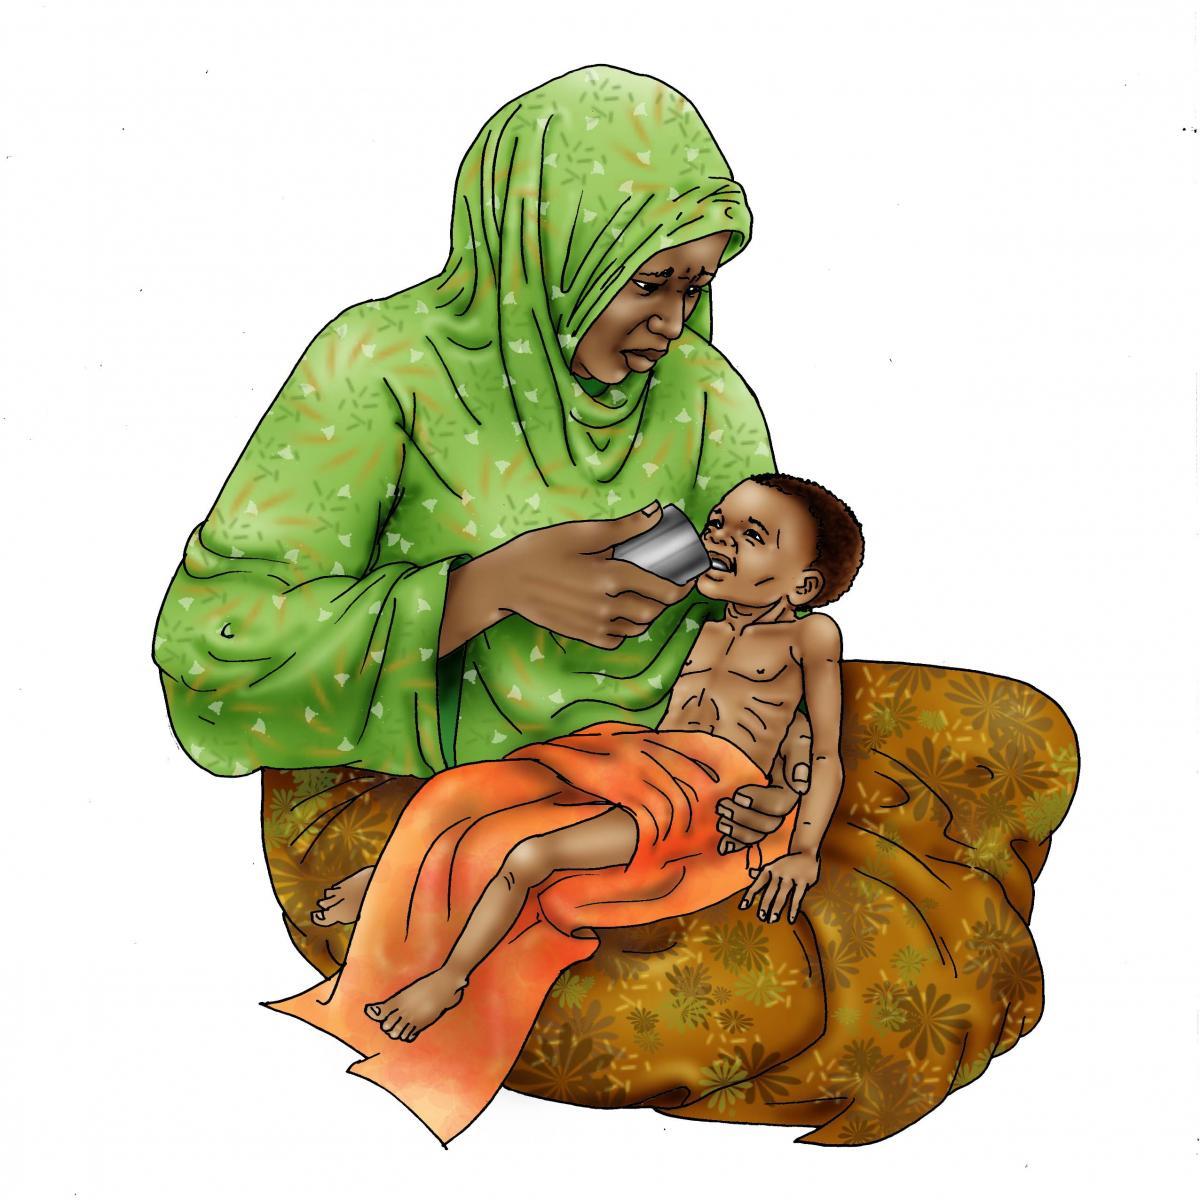 Sick Baby Nutrition - Feeding dehydrated baby 6-24 mo - 07 - Niger